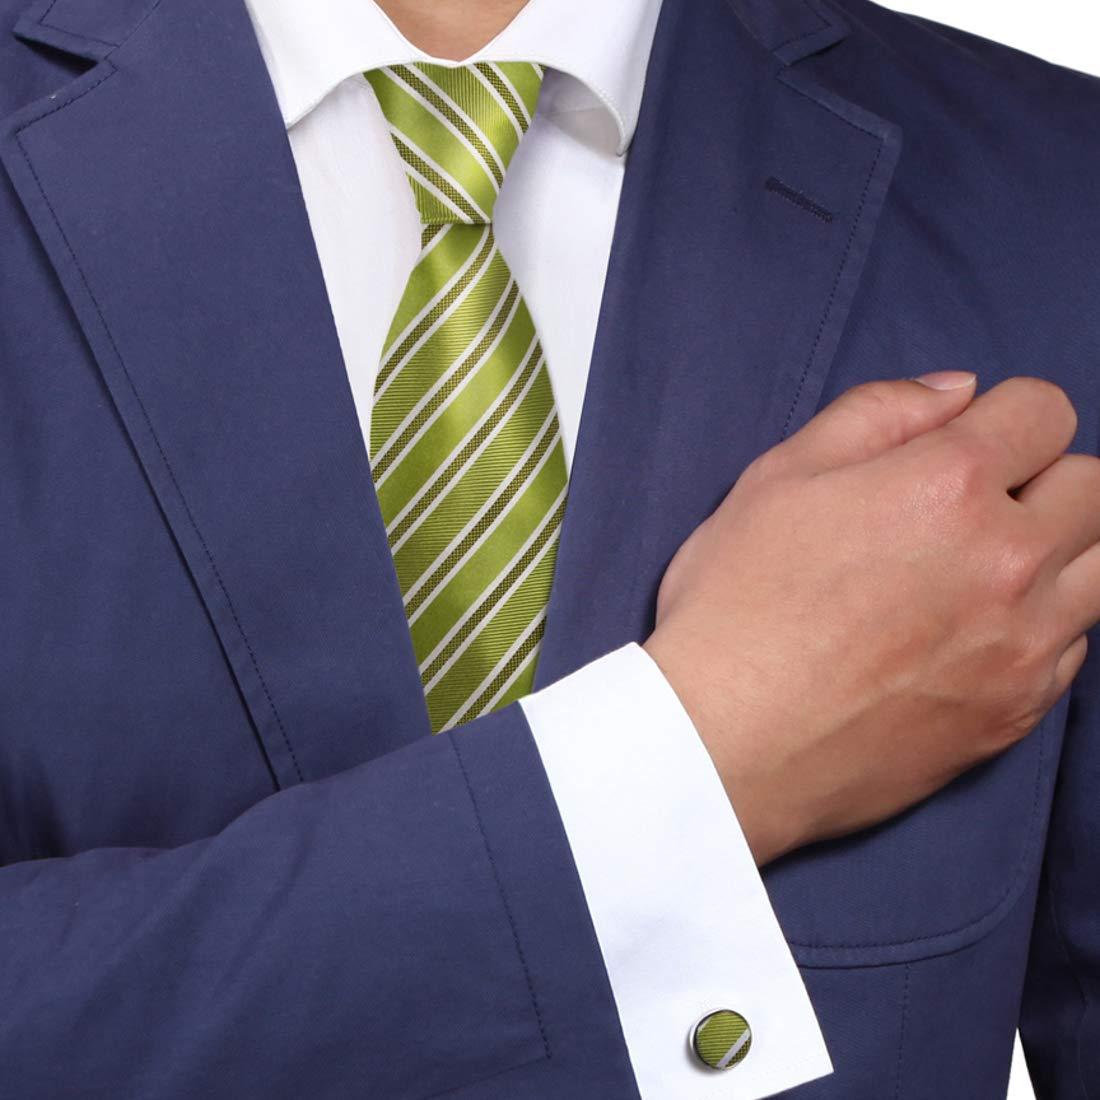 Y&G A1039 Yellow Green Stripes Formal Wear Goods Mens Discount For Boyfriends Silk Tie Cufflinks Set 2PT